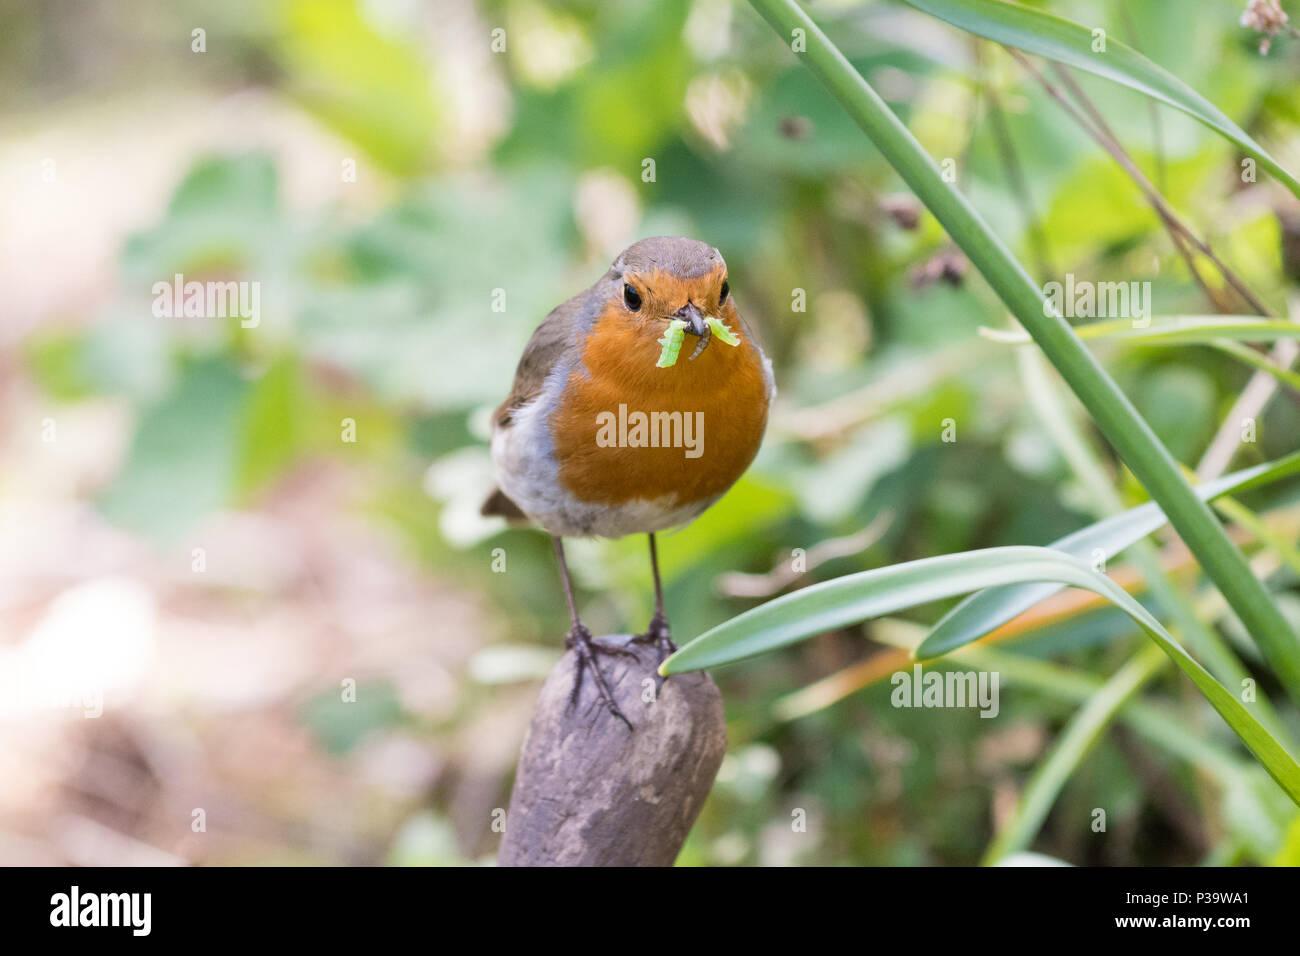 European Robin - Erithacus rubecula - with a green caterpillar in it's beak in a Scottish UK garden - Stock Image